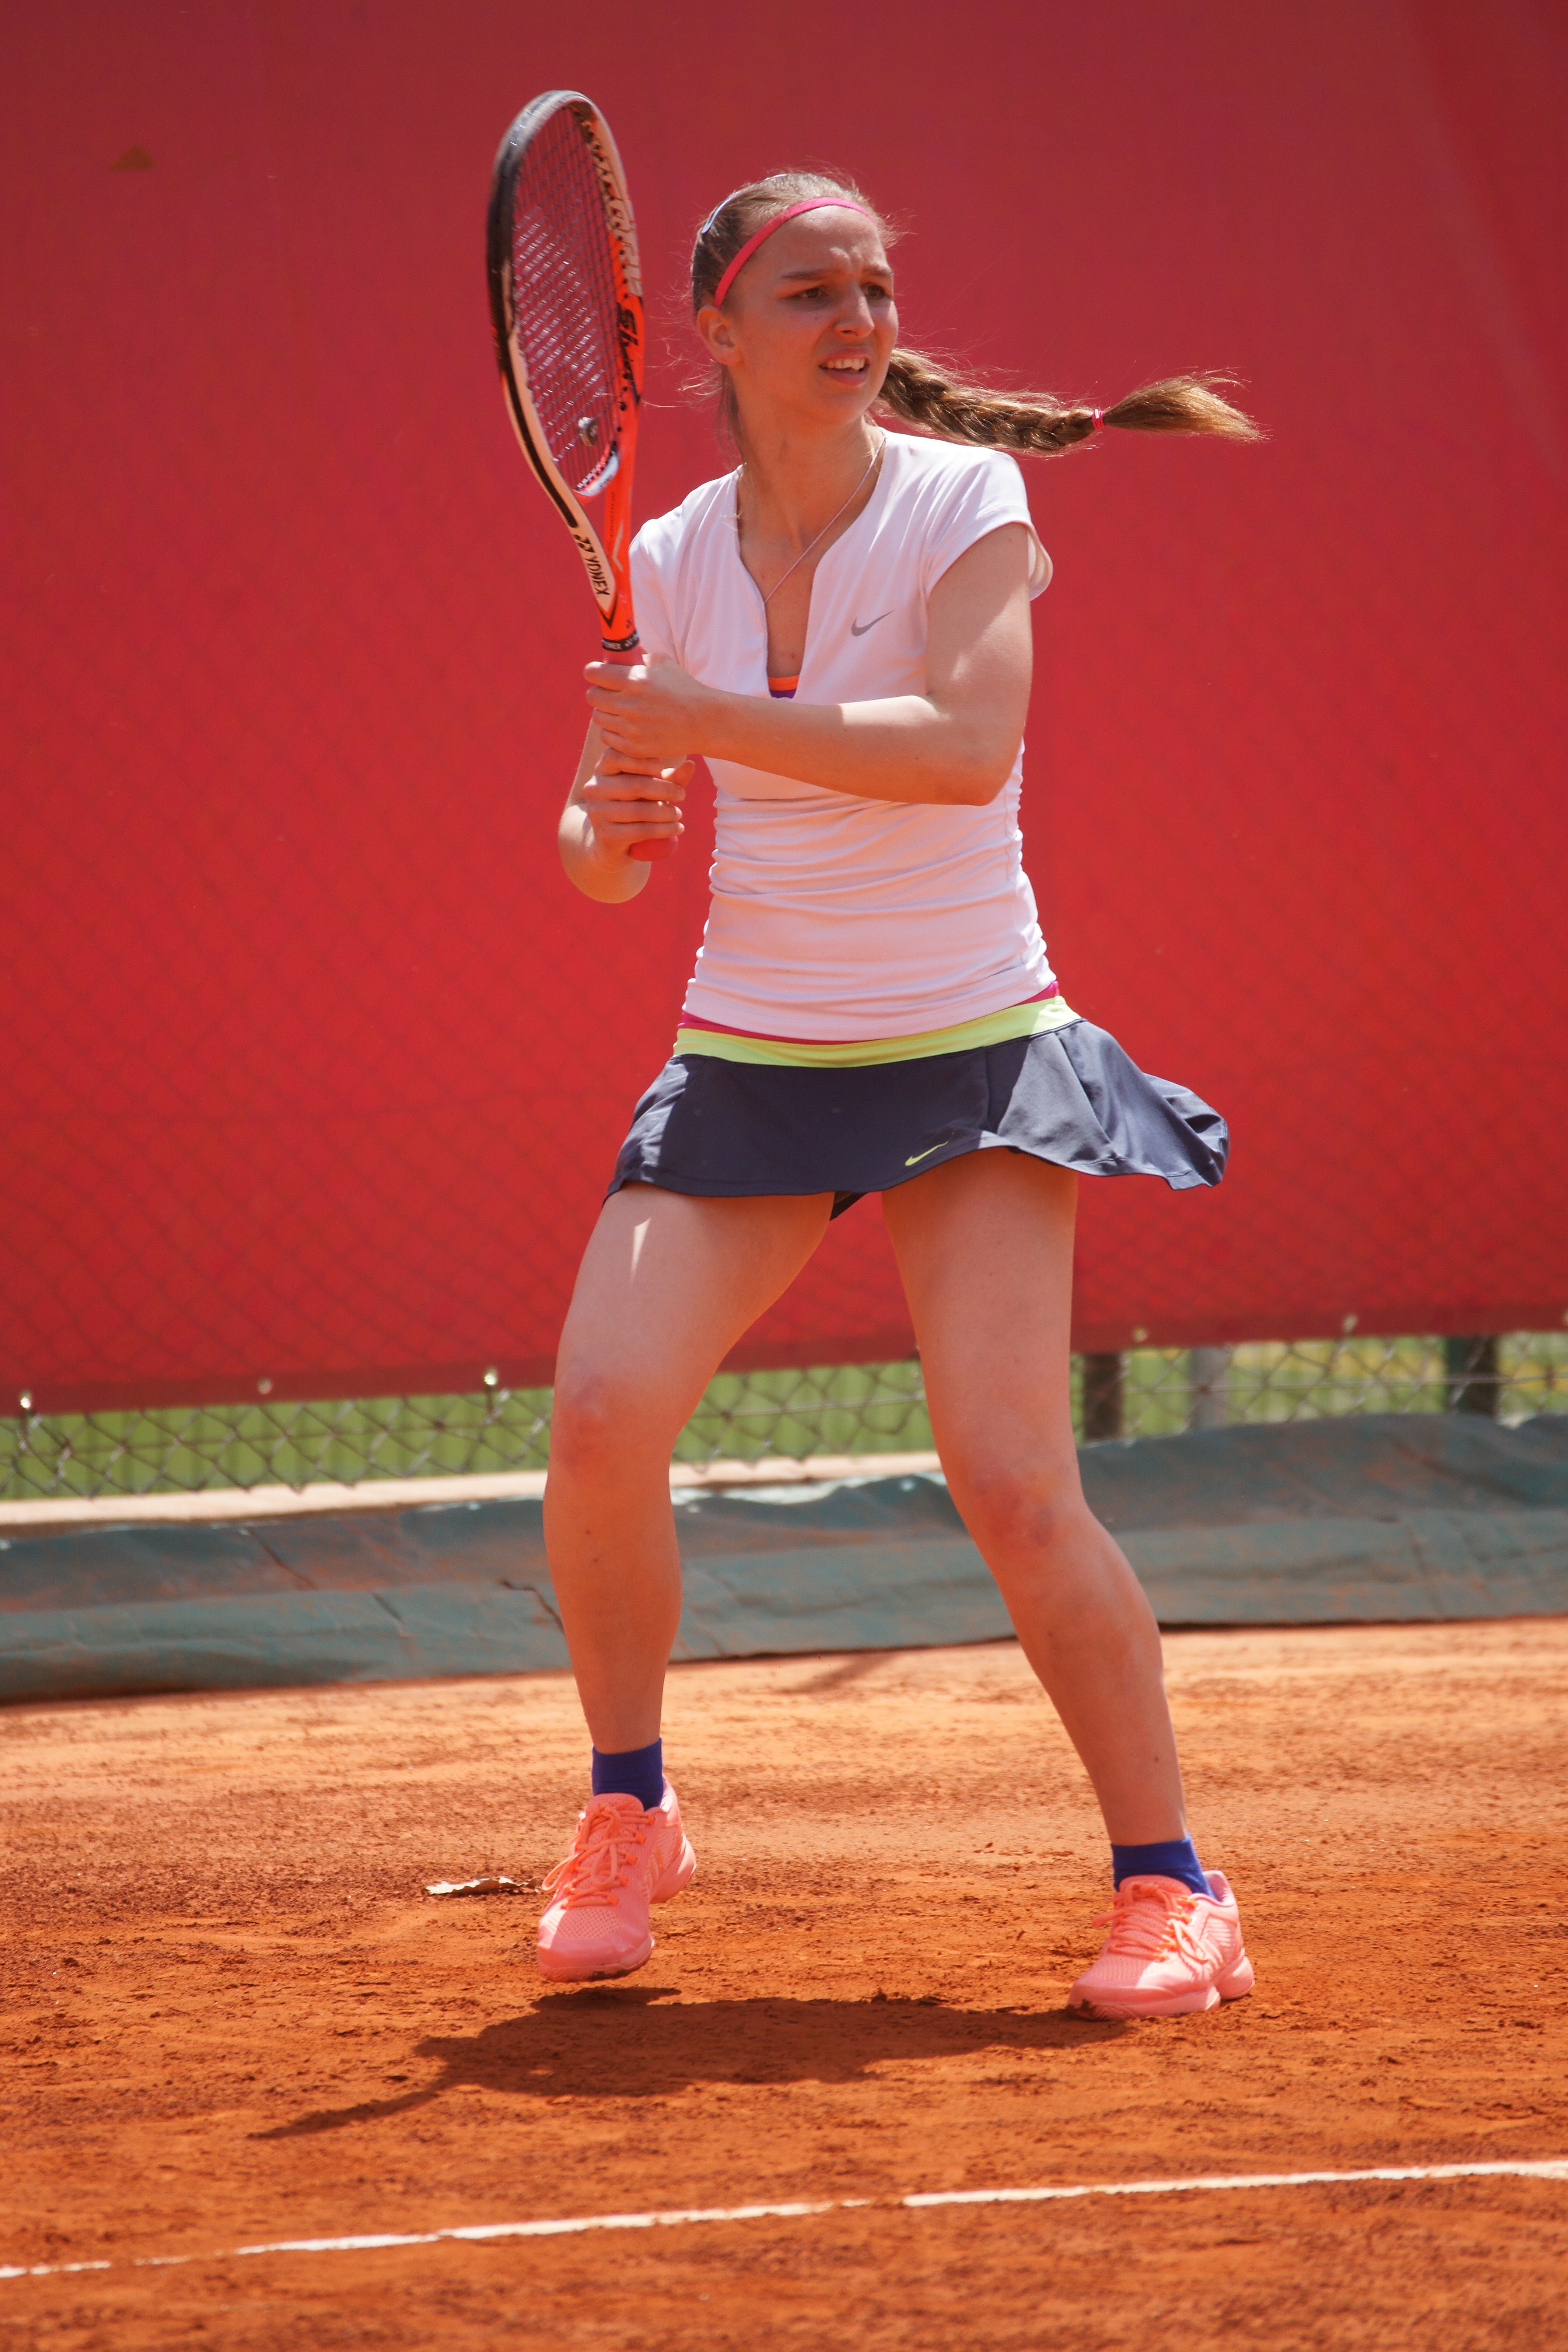 Tamara Korpatsch Net Worth 2018: What is this tennis player worth?